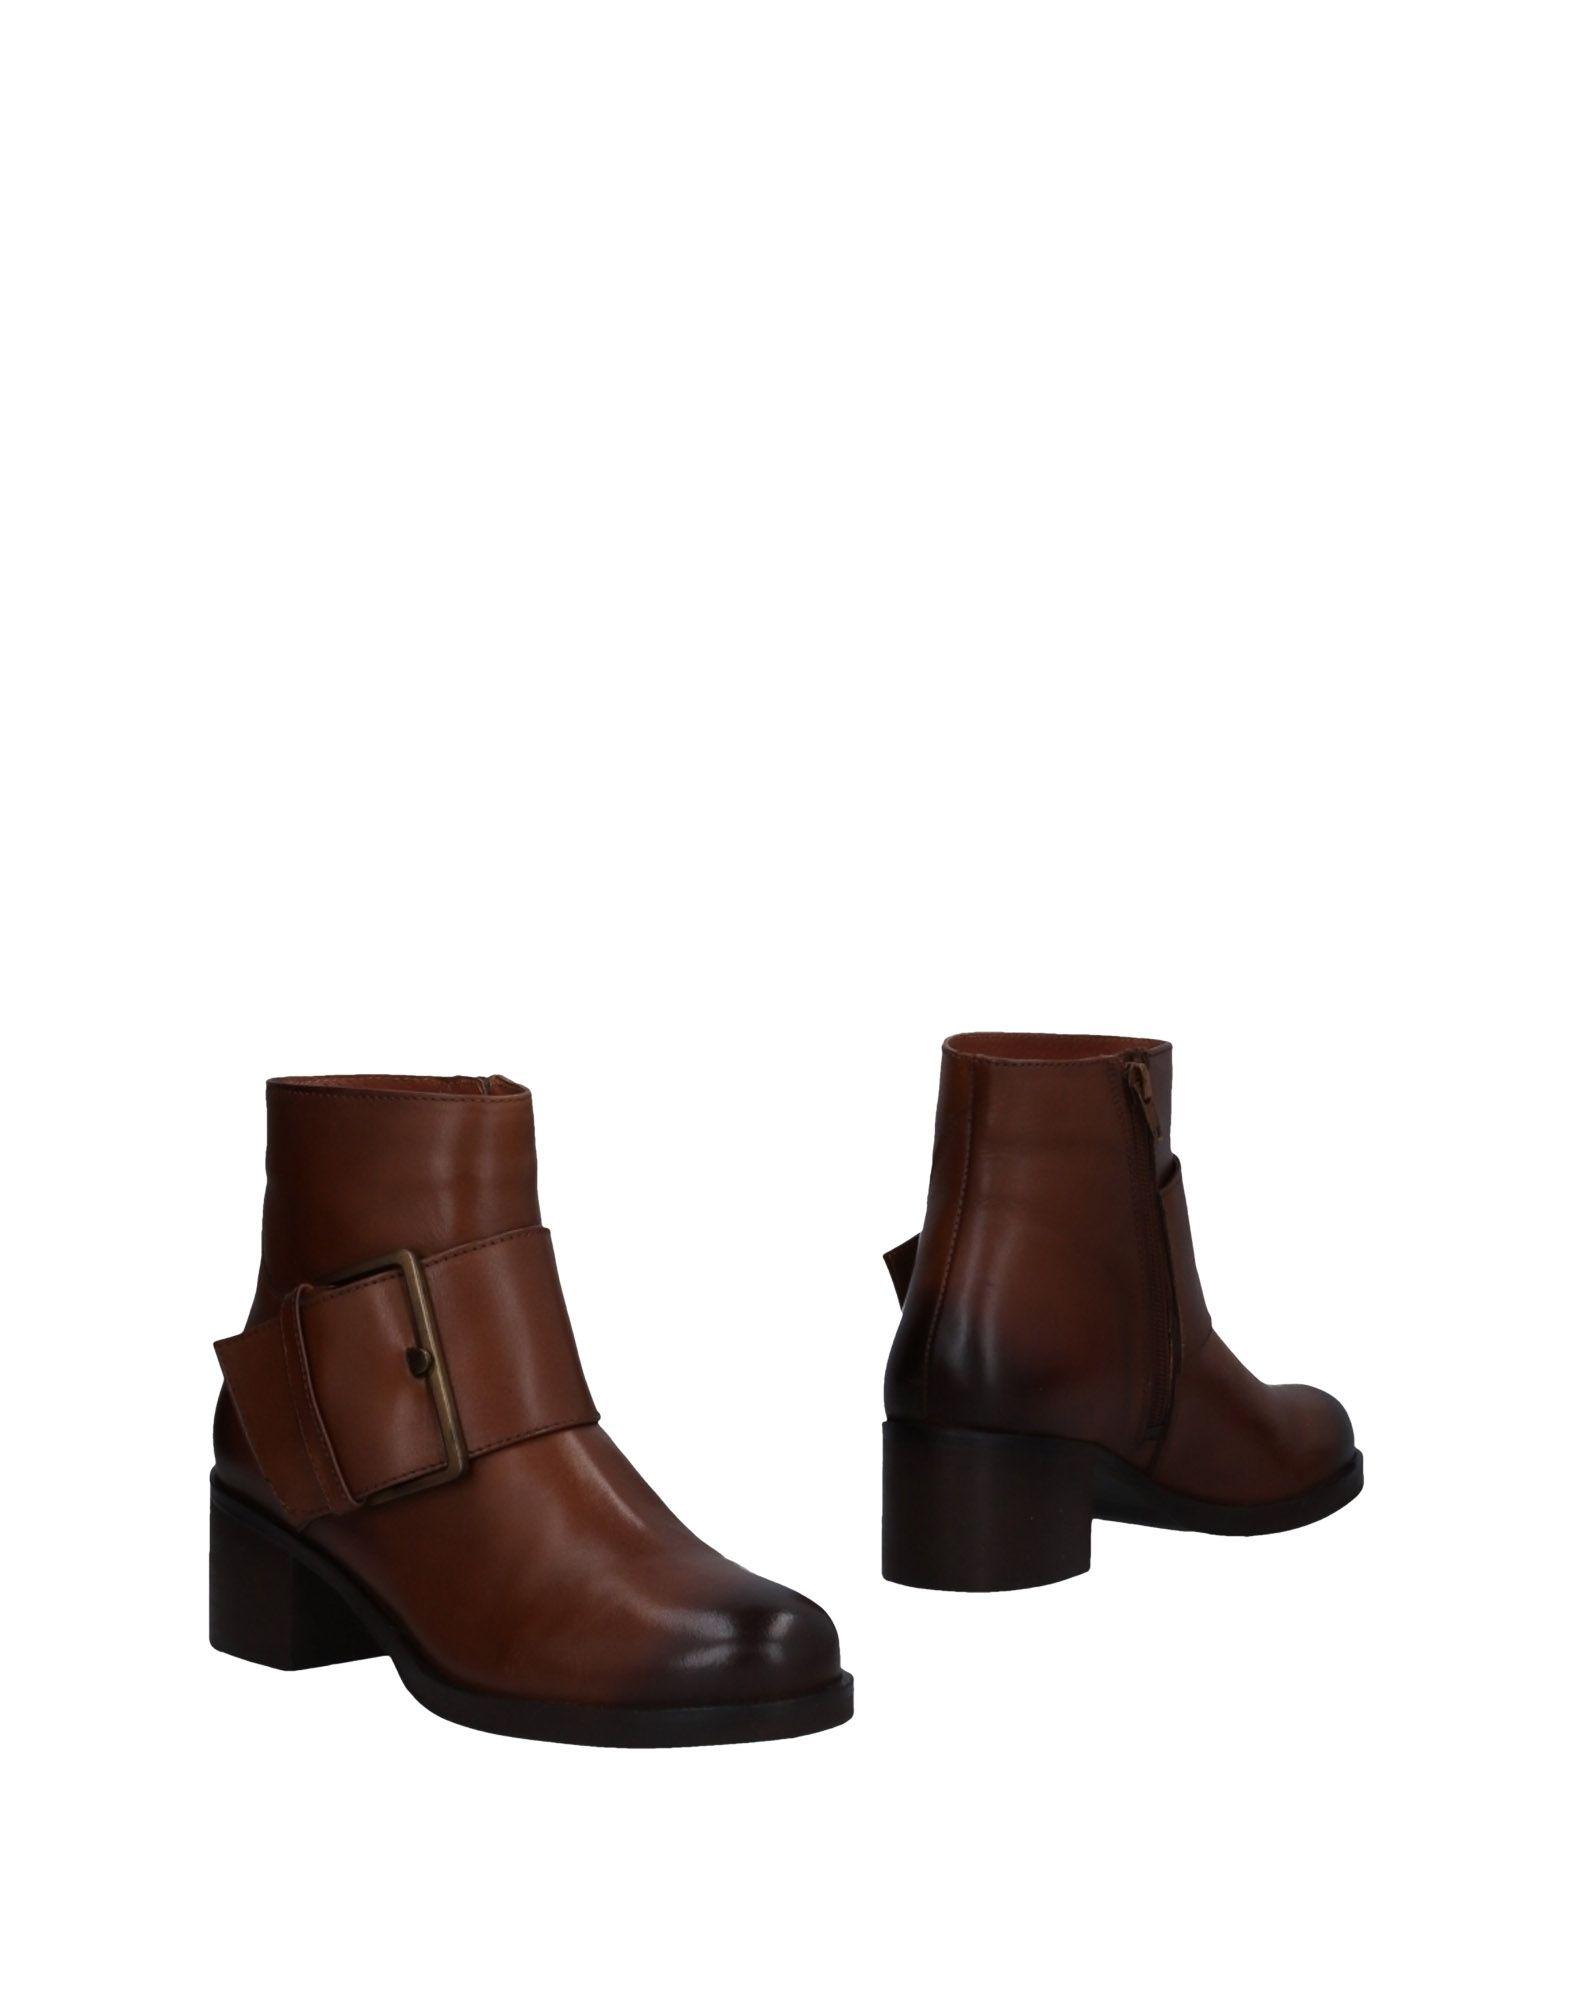 Carmela Gute Stiefelette Damen  11472245GX Gute Carmela Qualität beliebte Schuhe de5add